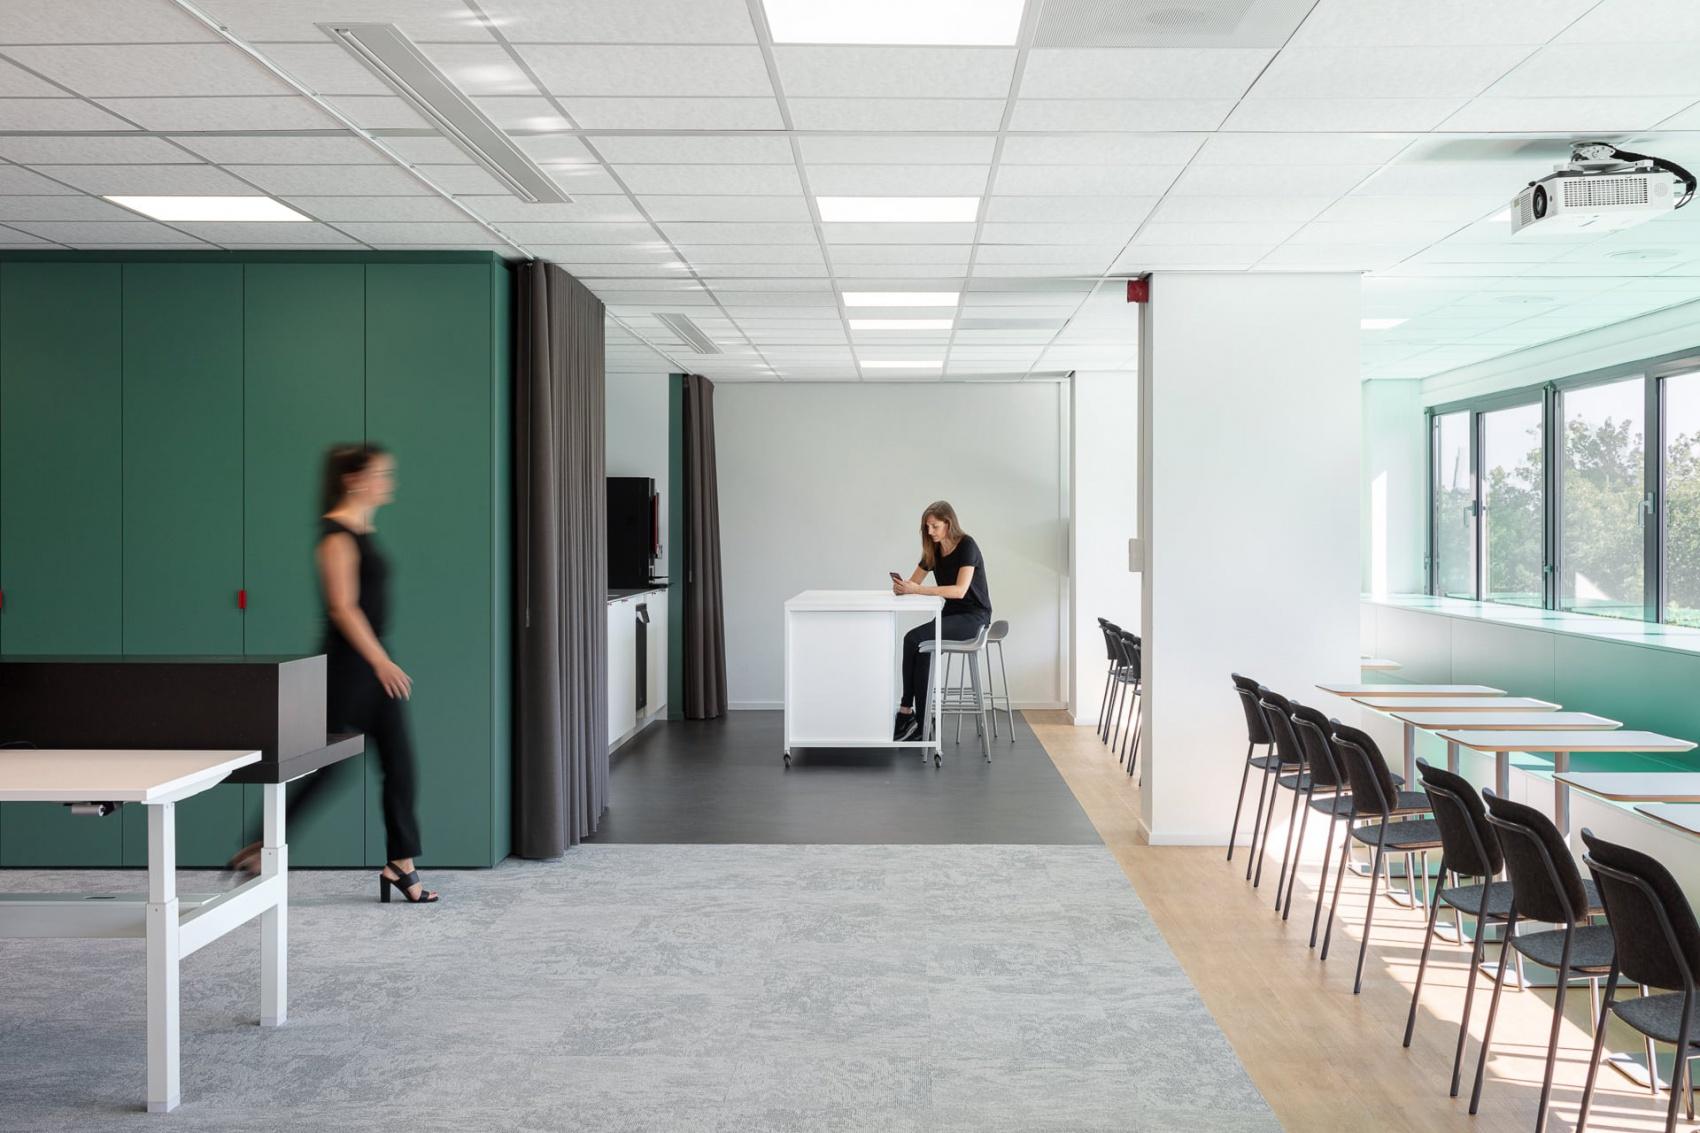 minimalisticky interier coworkingu so stolickami hale od devormu